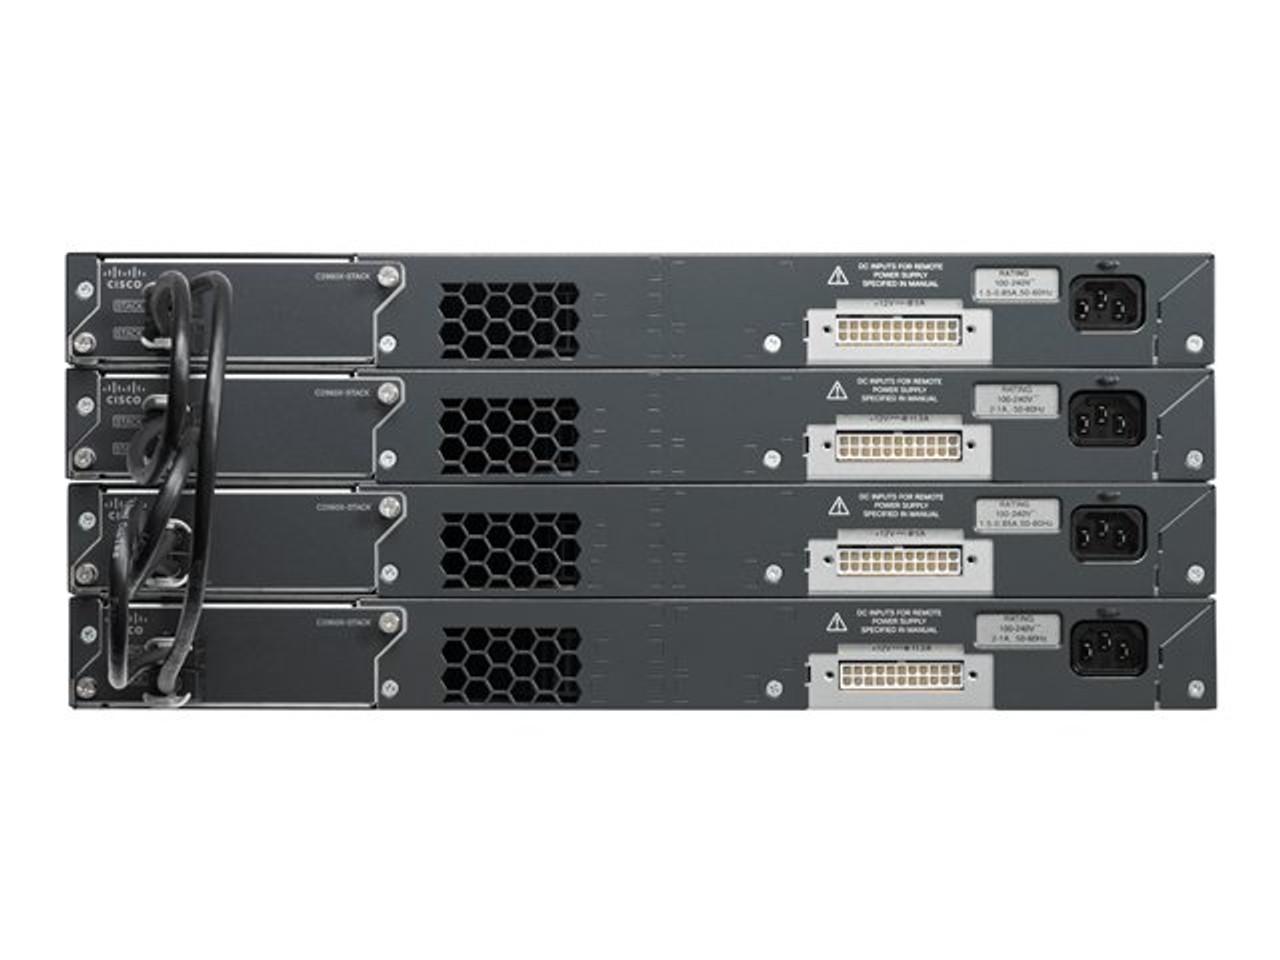 Cisco Catalyst WS-C2960X-48TS-L Switch 48 Ports Managed Desktop